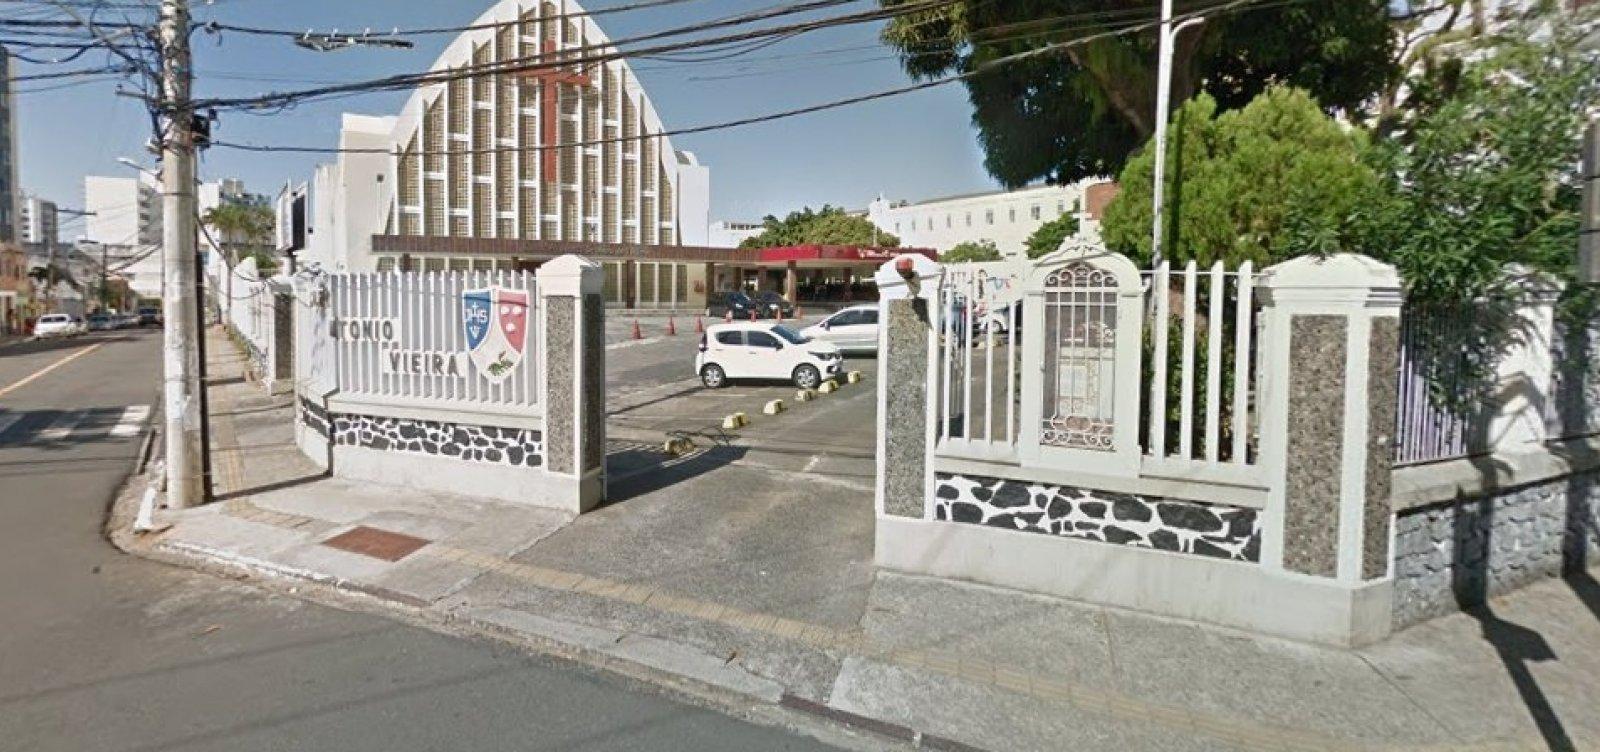 Sindicato critica colégio por manter aulas após caso de aluna com covid-19